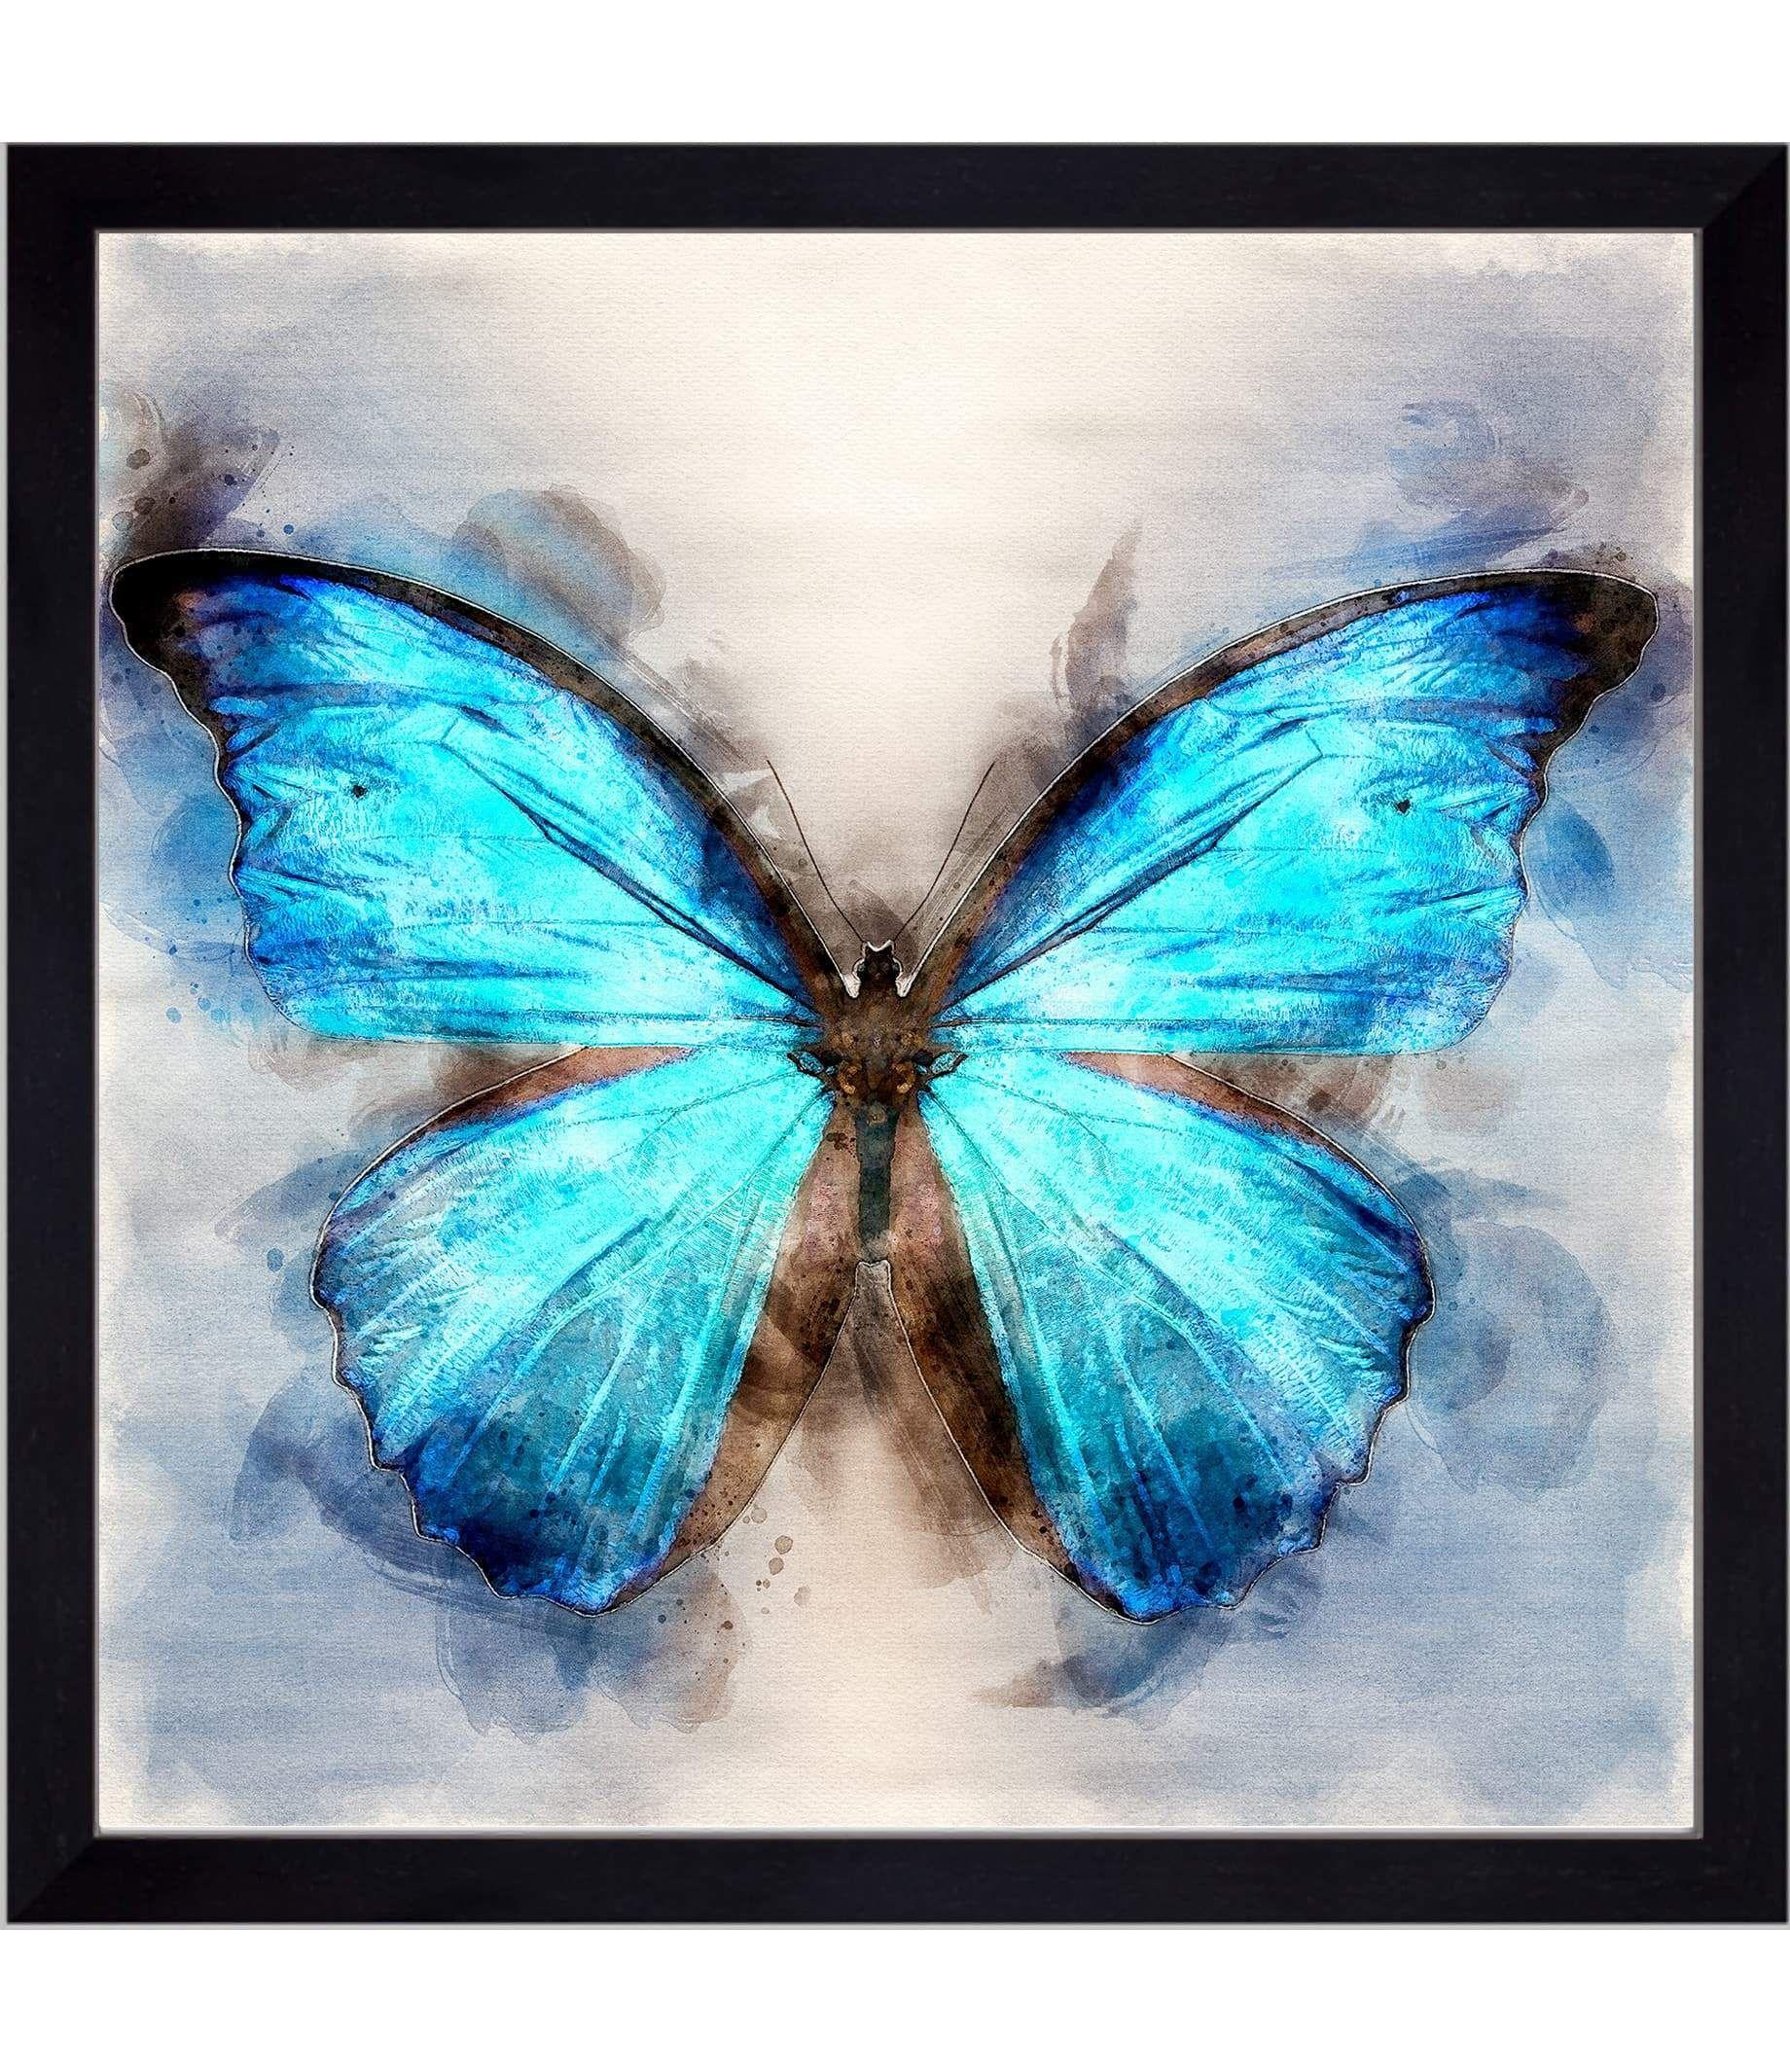 The Bluest Butterfly - 30x30 / Black Frame